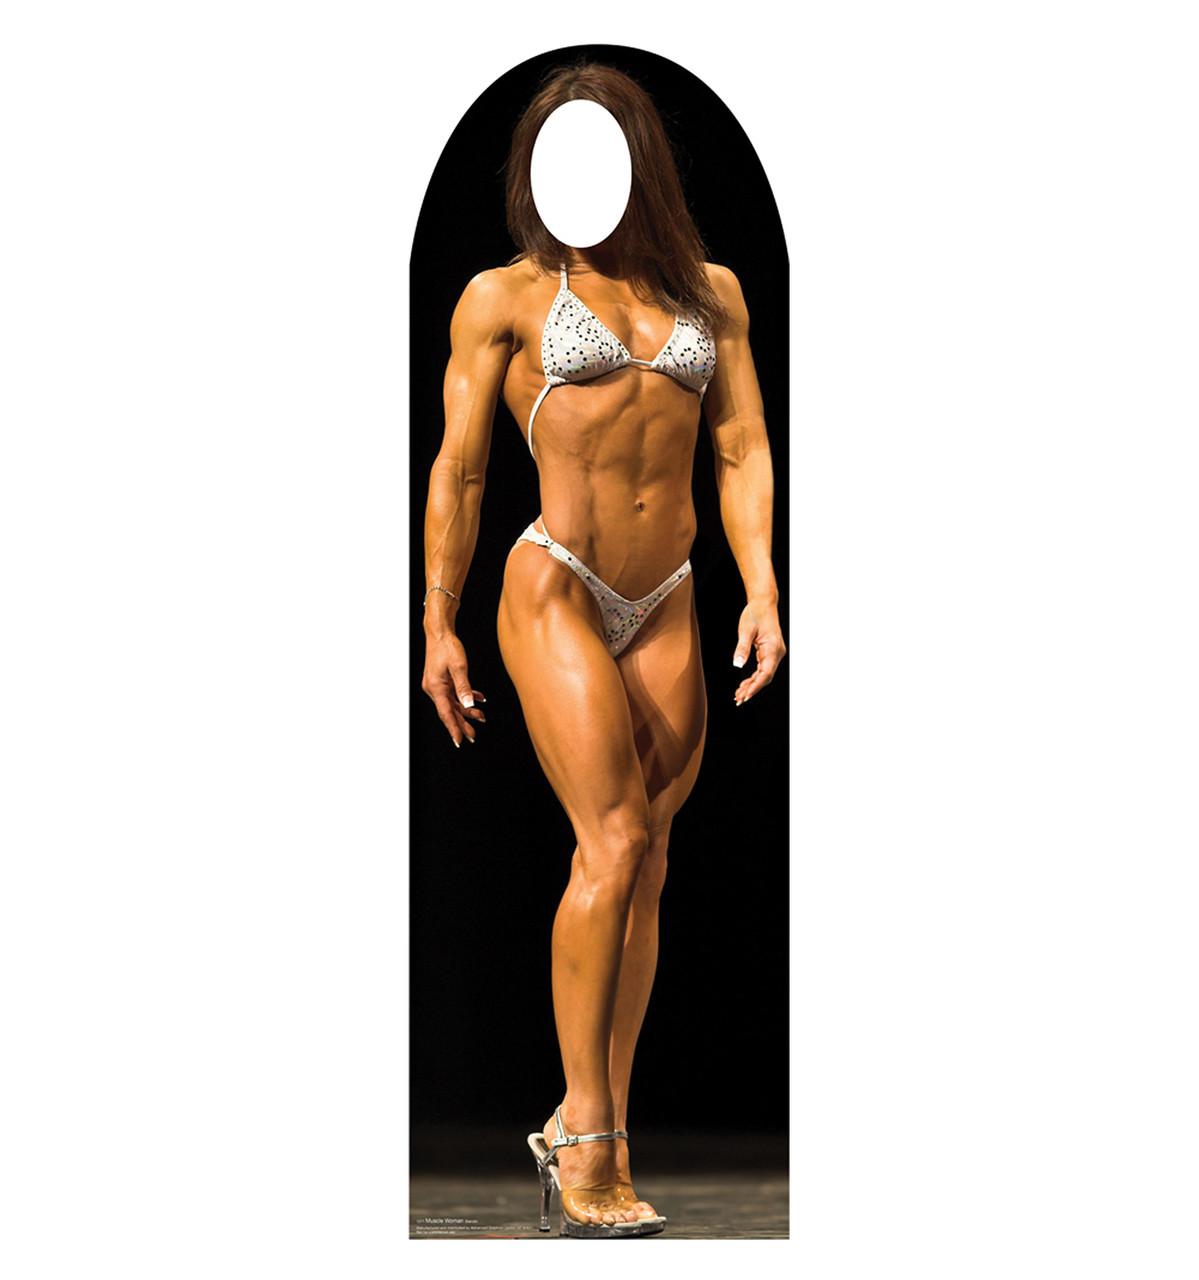 Life-size Muscle Woman Standin Cardboard Standup